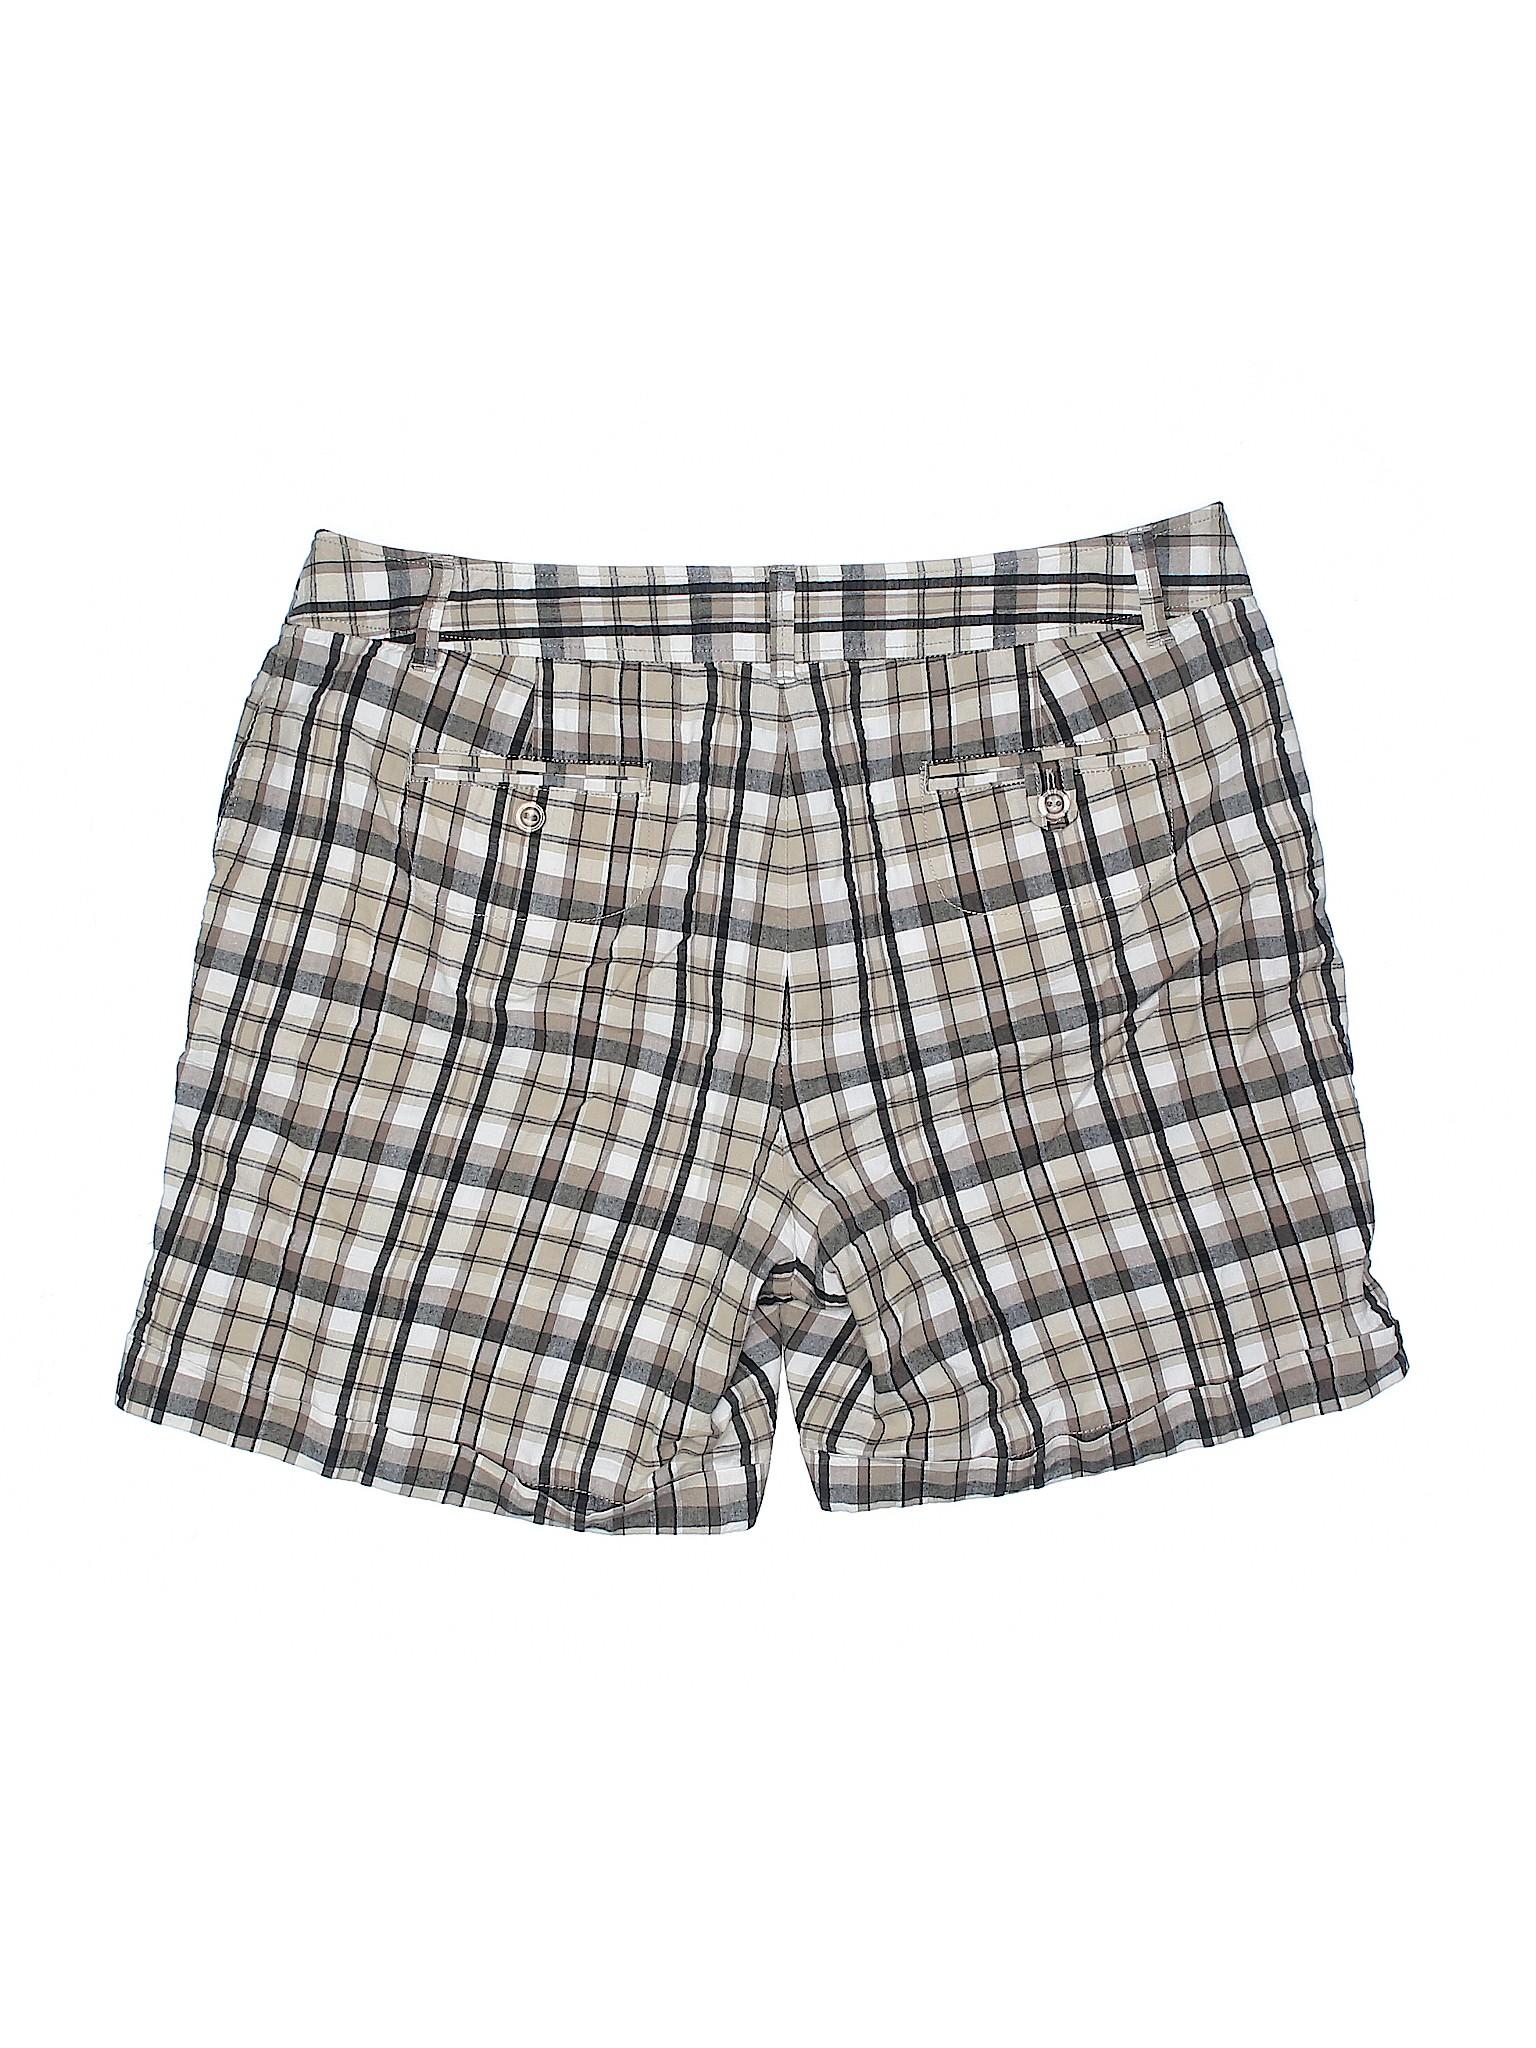 Rafaella Boutique Shorts Boutique Rafaella 8qEOwxaxn